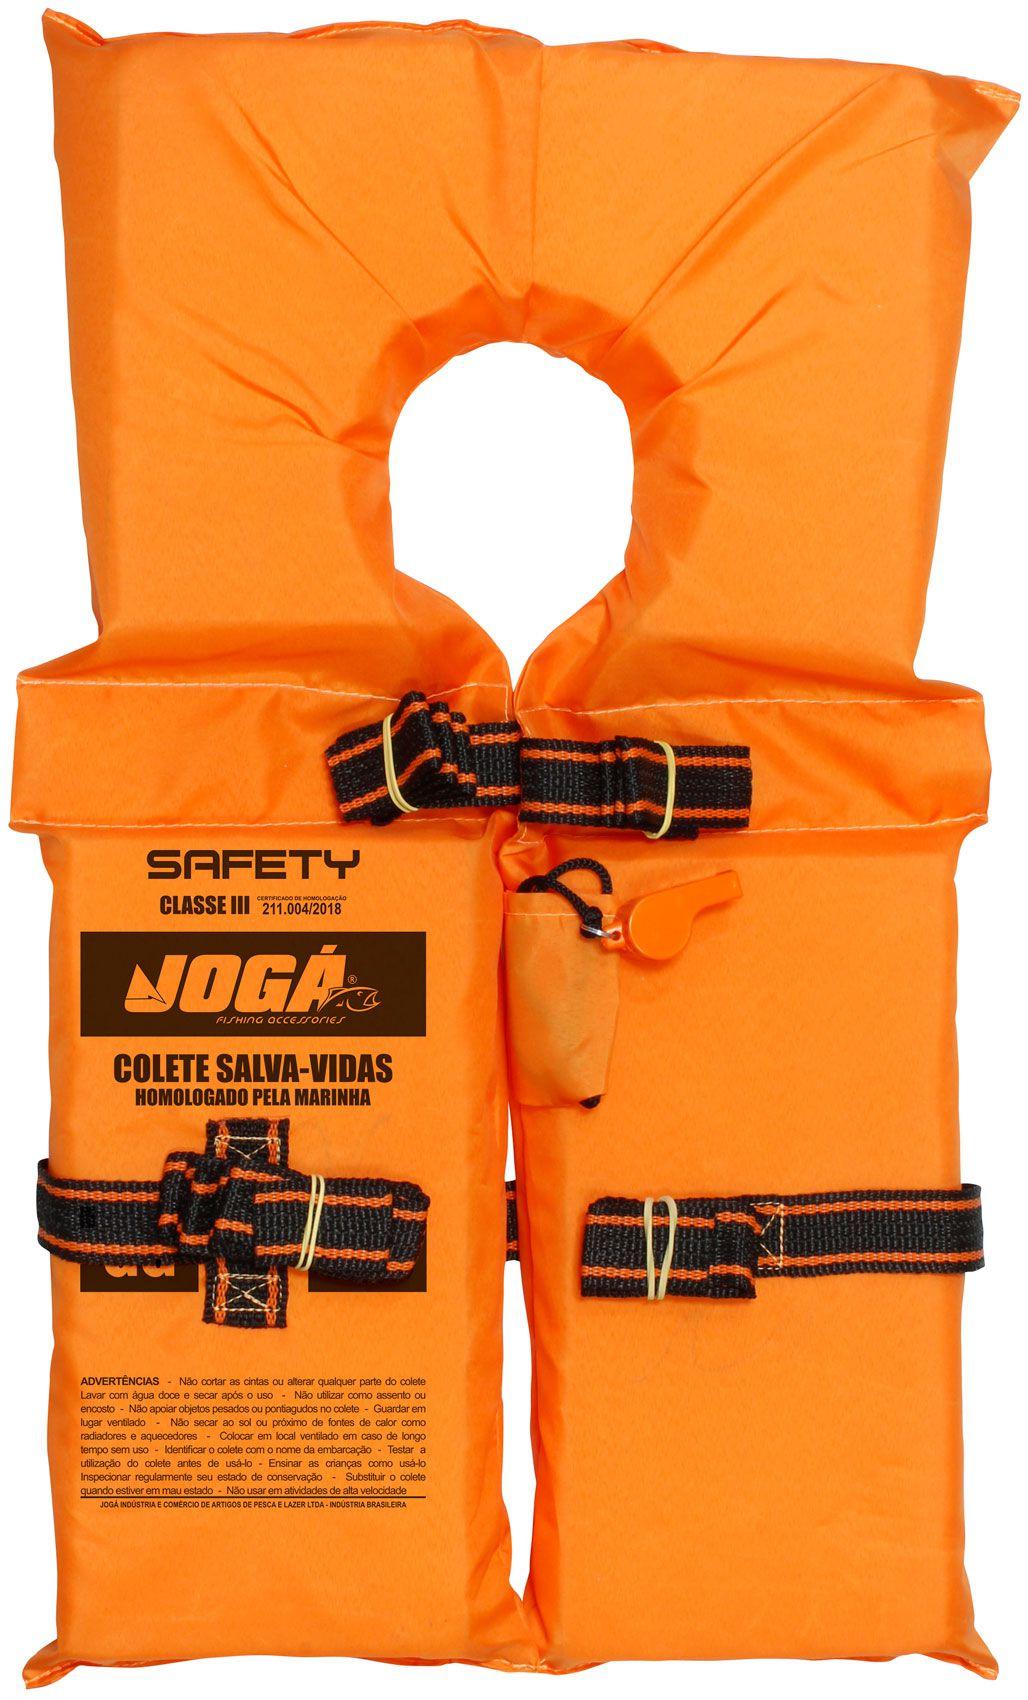 Colete Salva Vidas Jogá Classe 3 Safety Laranja - GG